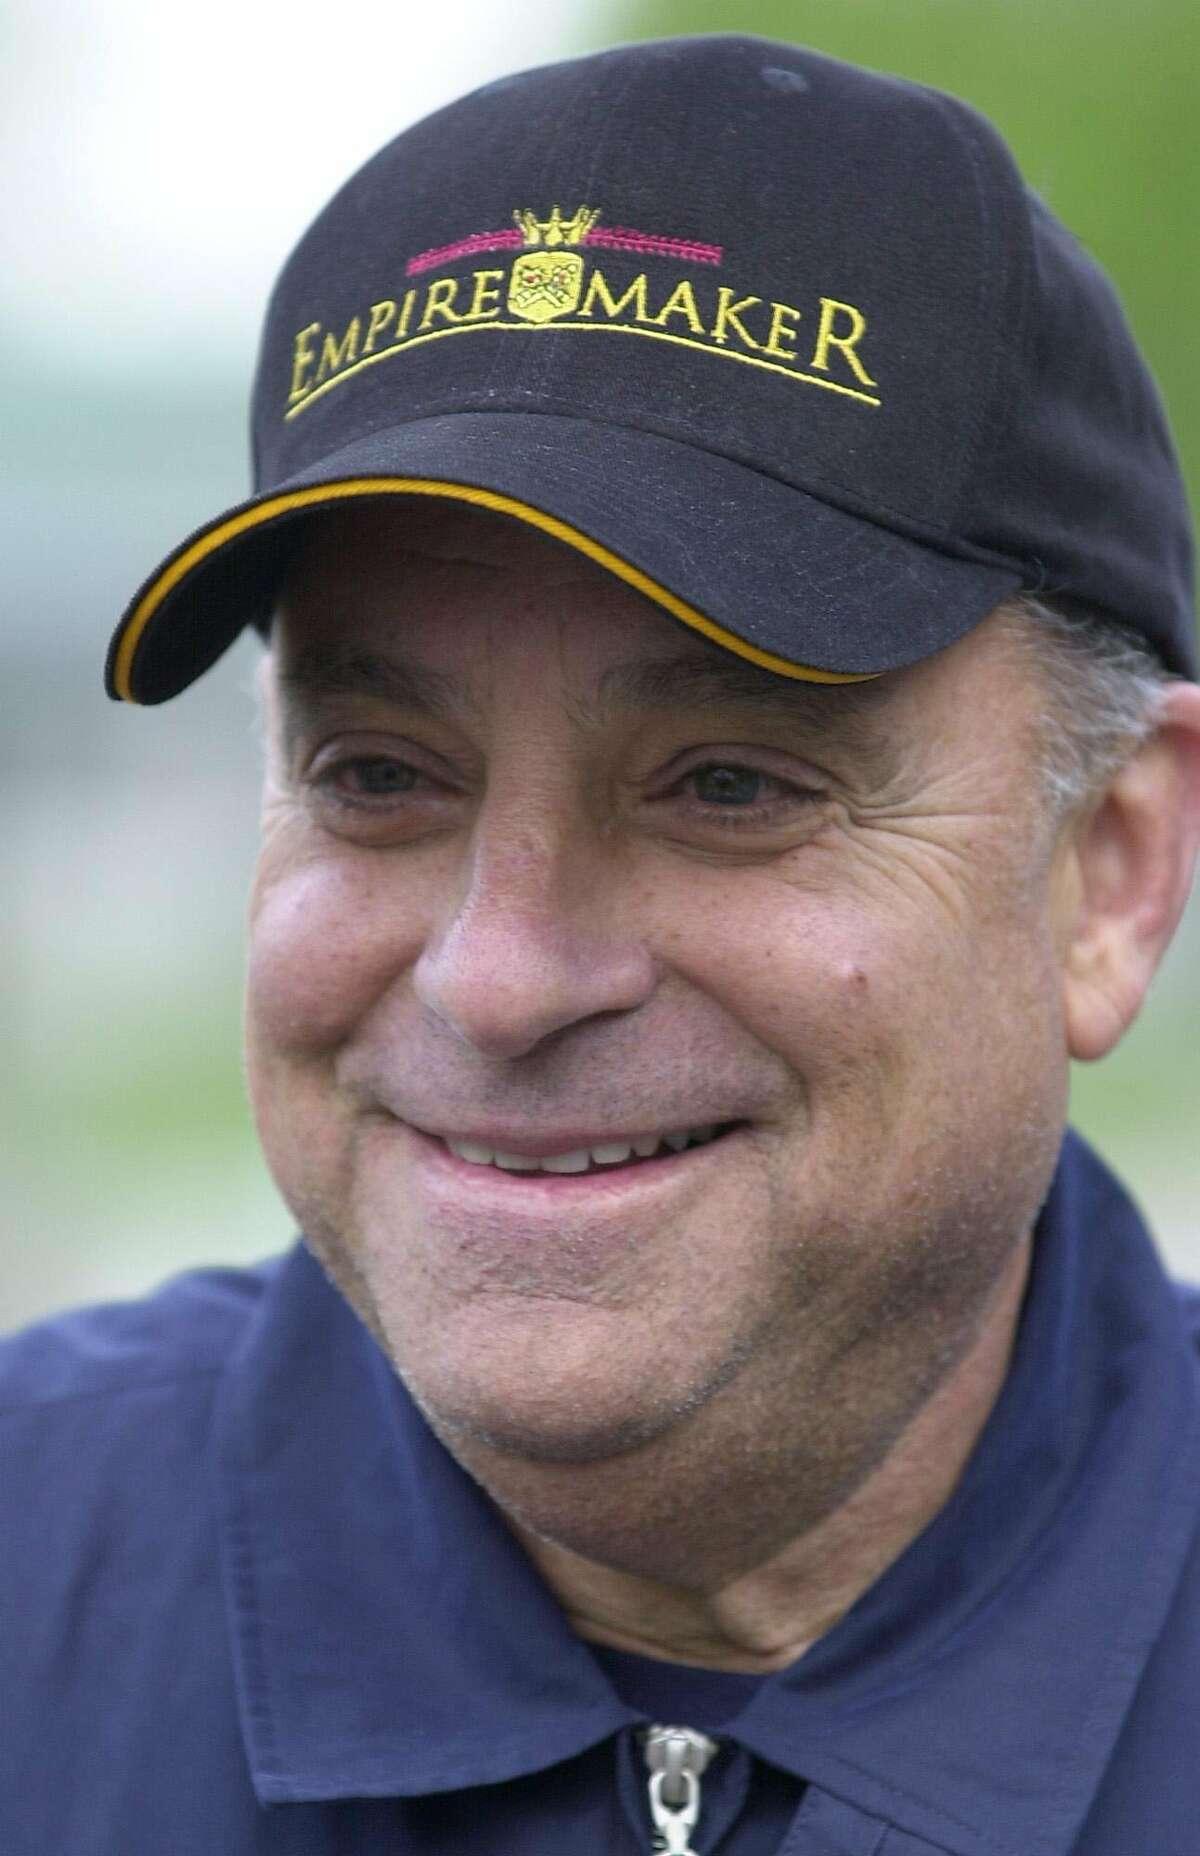 Hall of Fame horse trainer Bobby Frankel